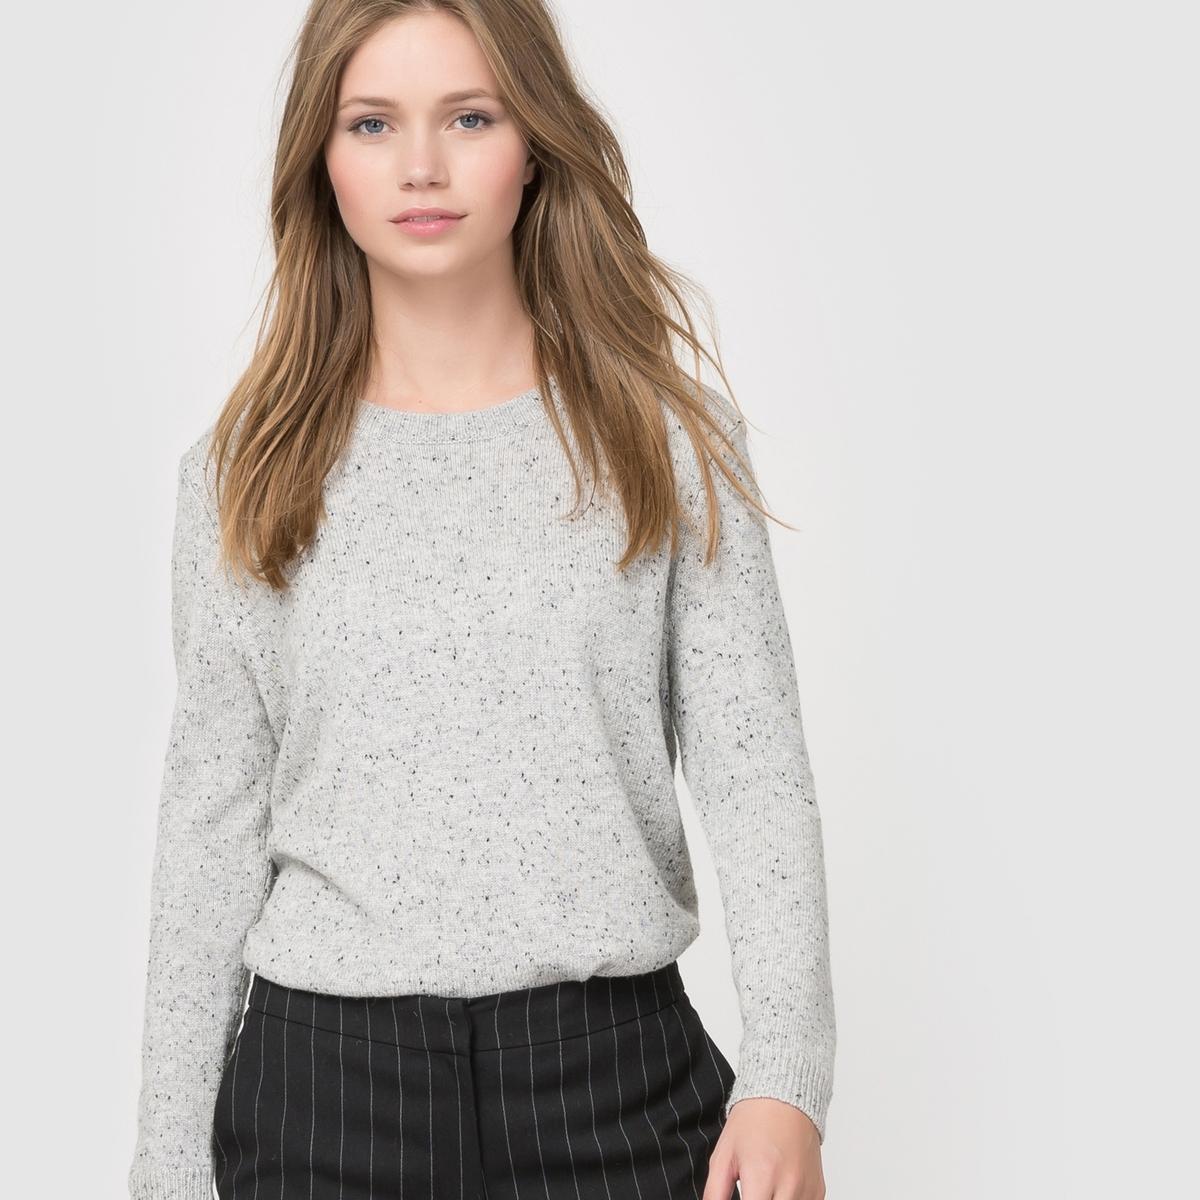 Пуловер из трикотажа в крапинку, 52% шерсти